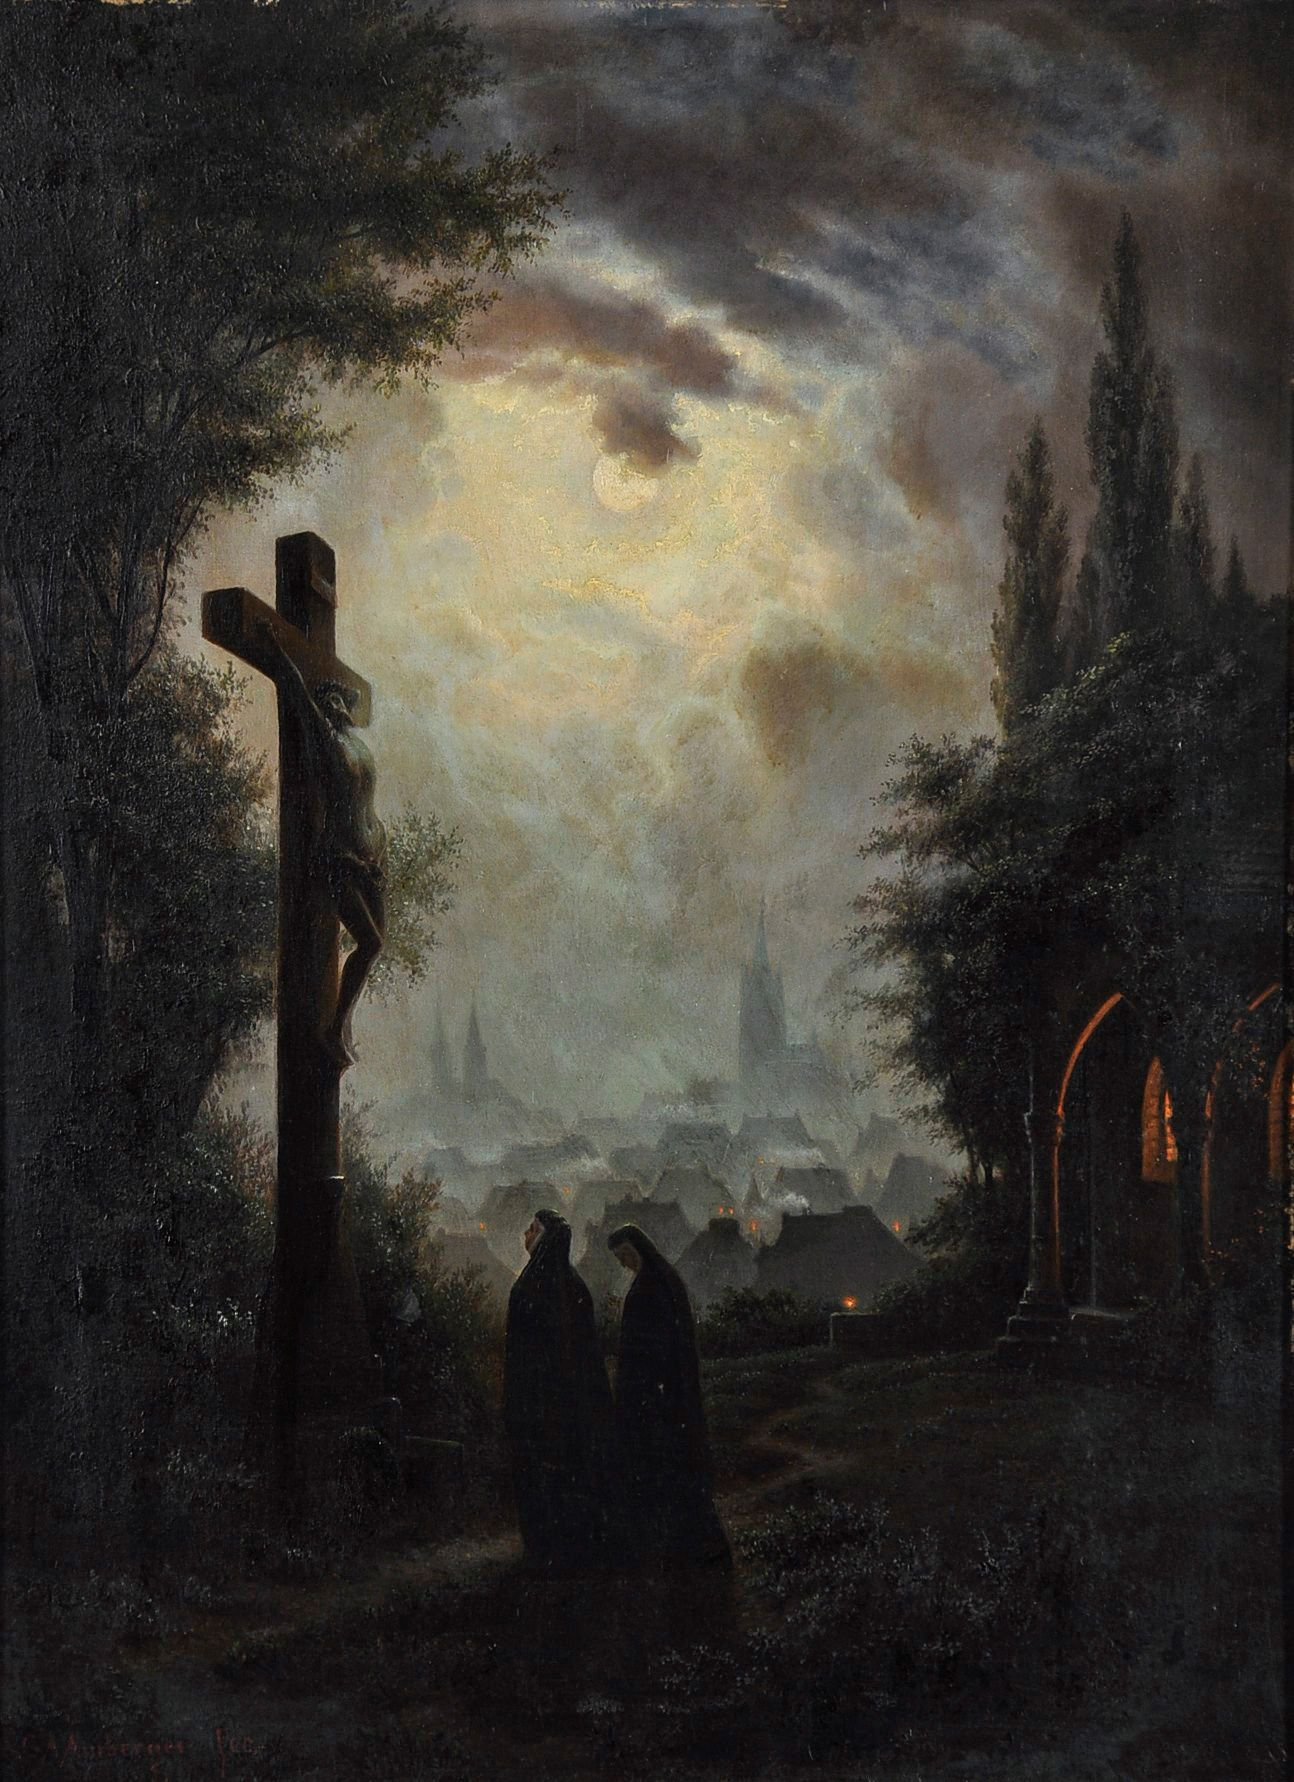 1870, La Cruz en la media noche de Gustav Amberger